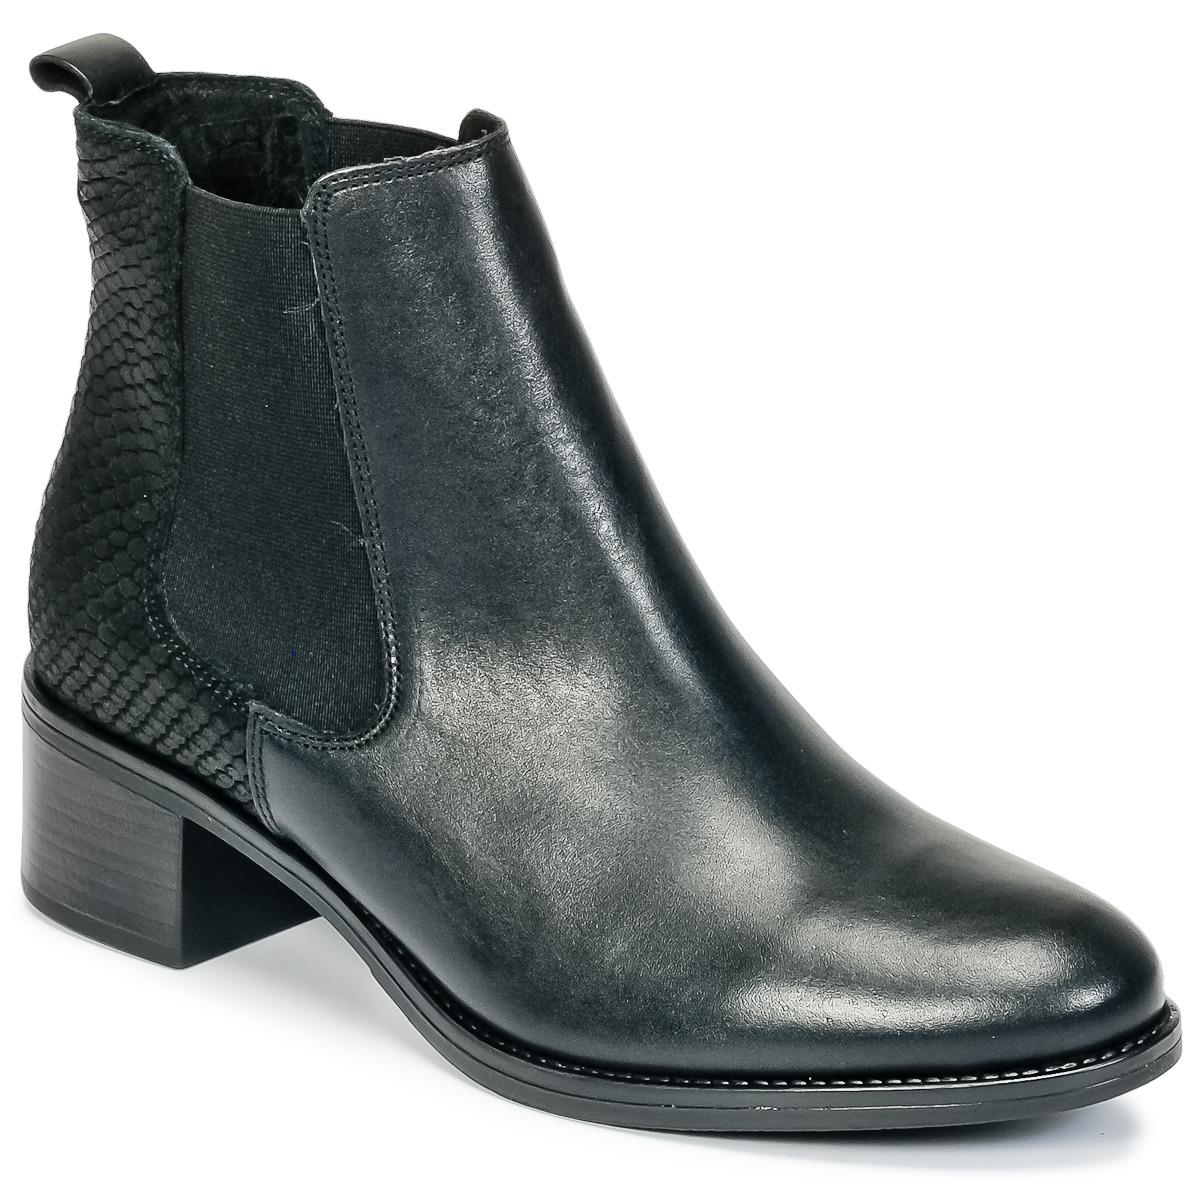 Assez Chaussures Femme - Soldes sur un grand choix de Chaussures Femme  OG65